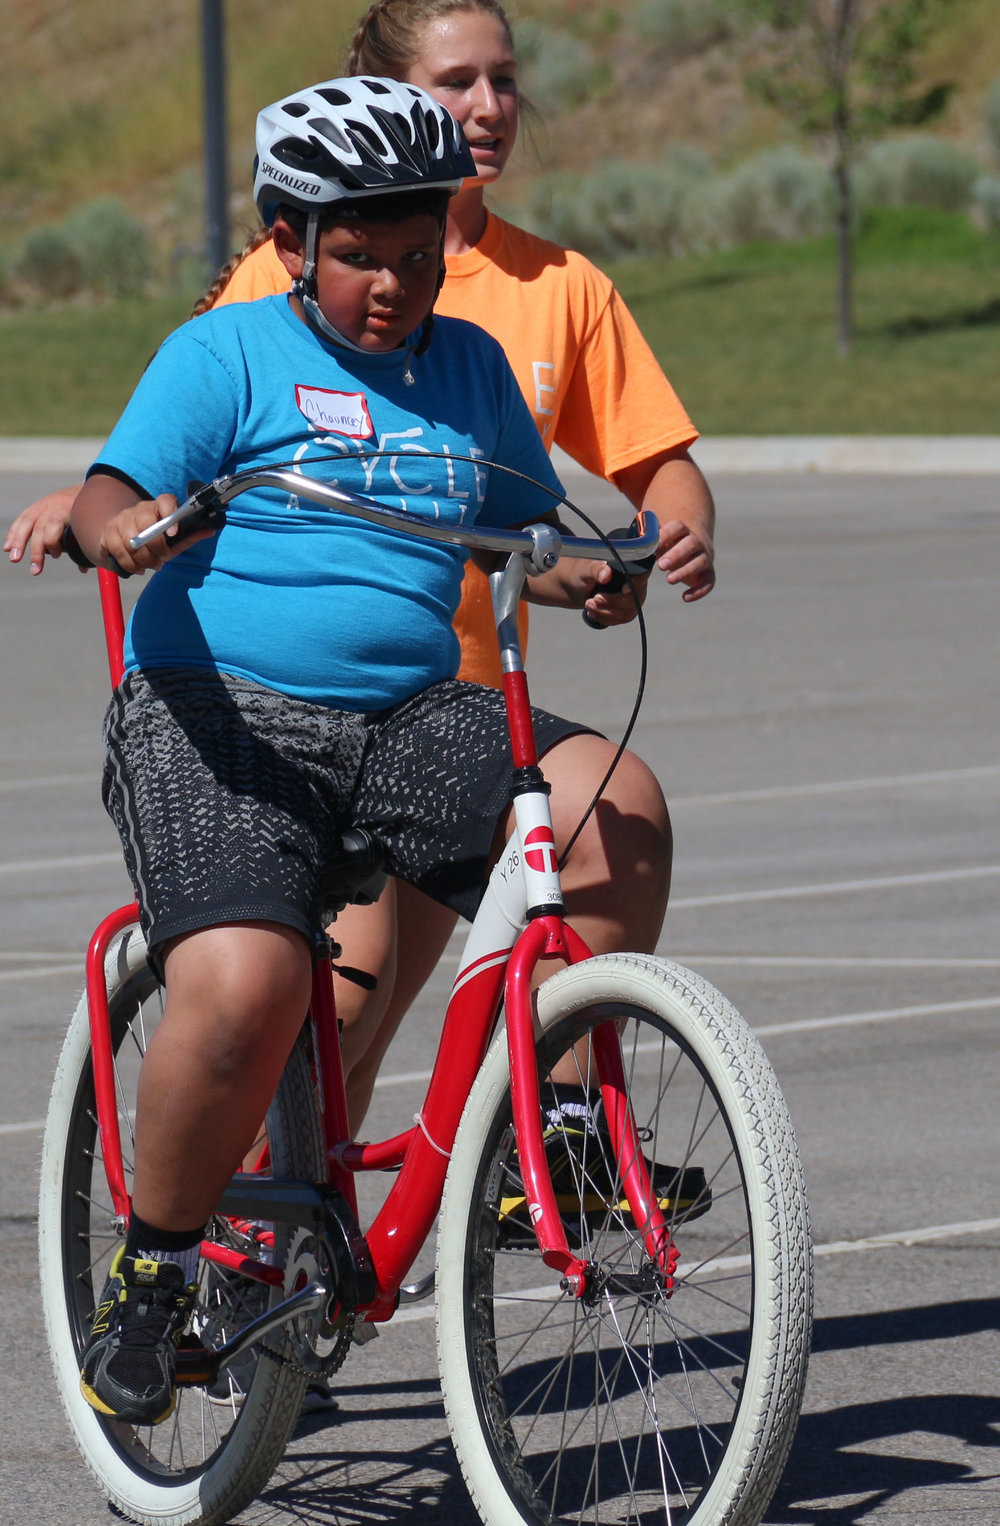 CycleAbility2017-Chauncey4.jpg